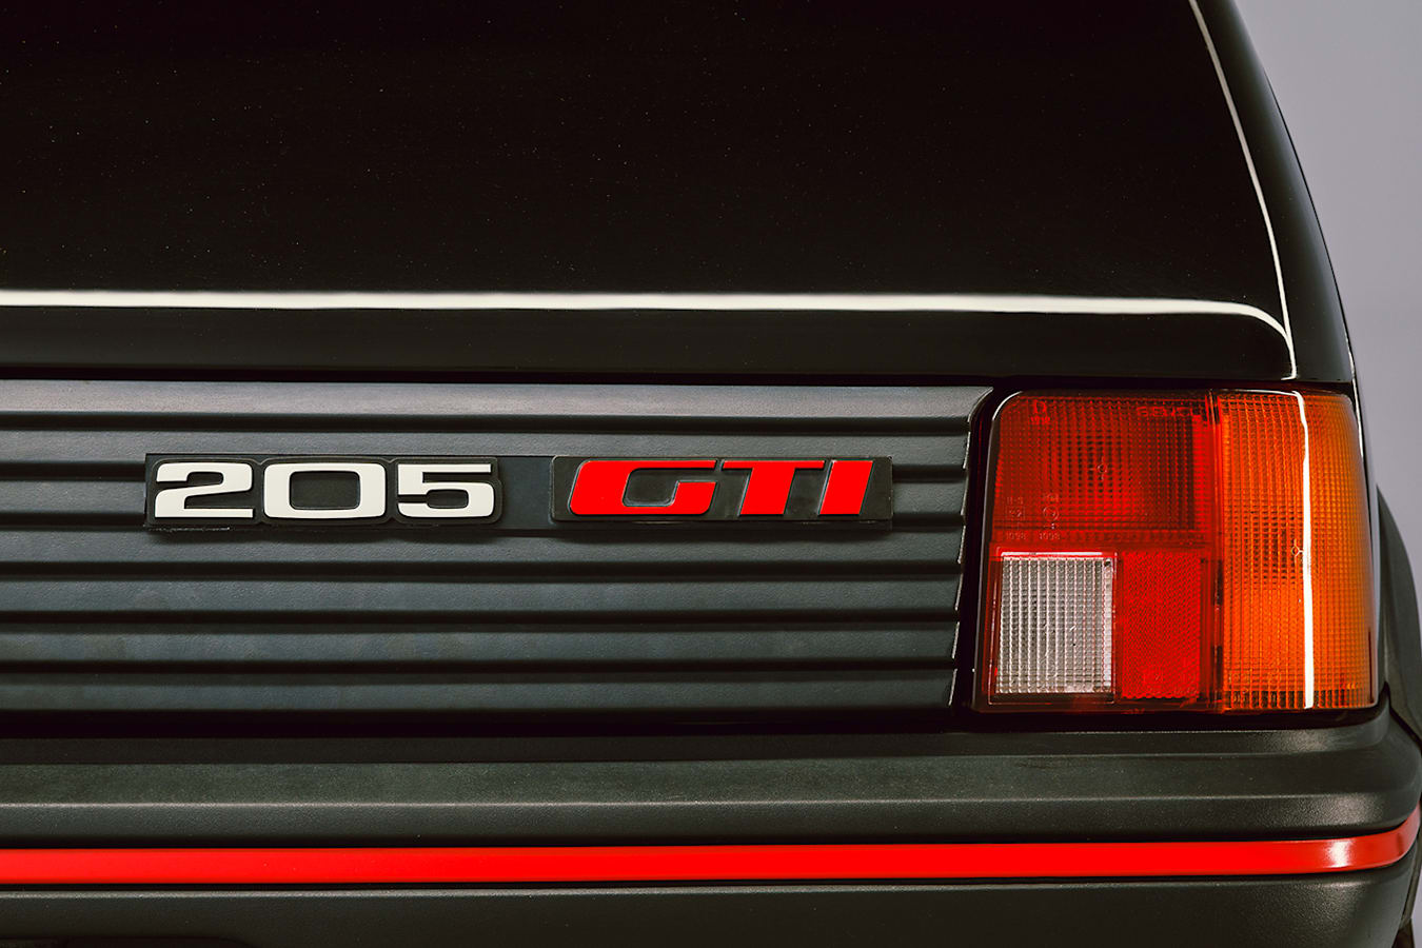 Classic Peugeot 205 GTi Badge